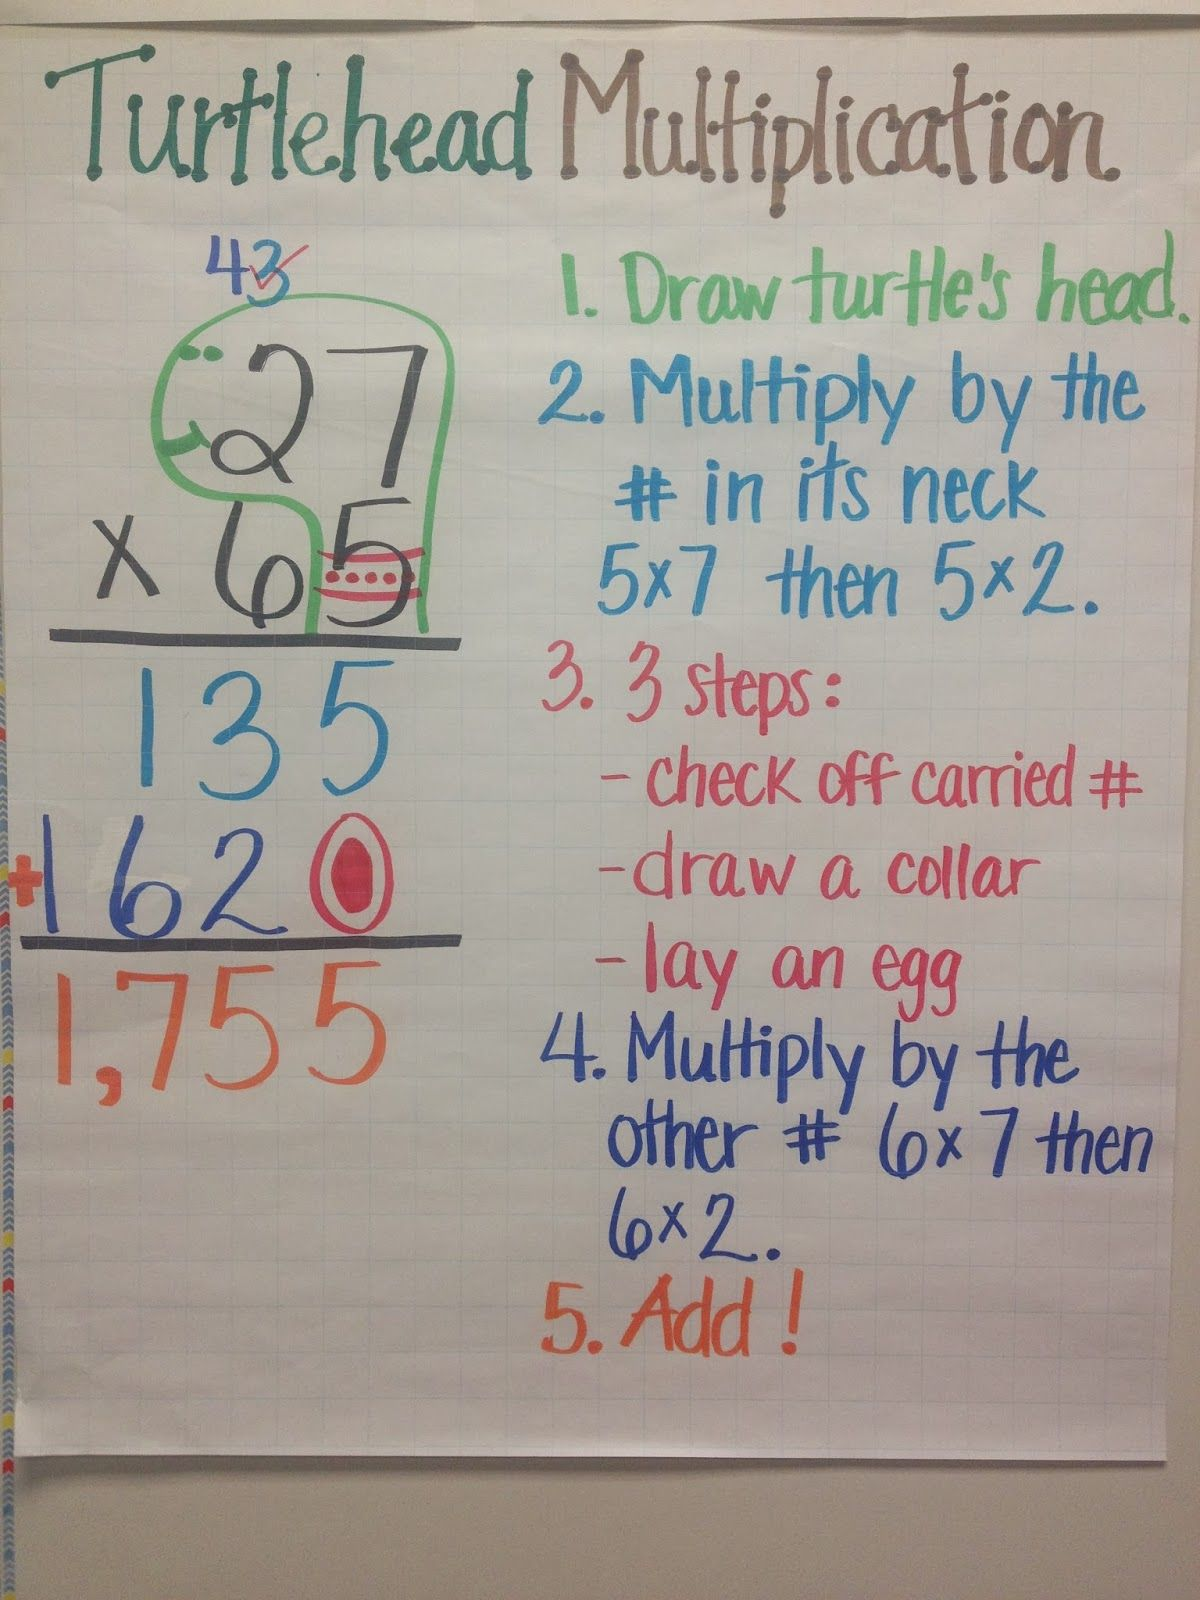 ms cao 39 s 4th grade math multiple digit multiplication school ideas skola. Black Bedroom Furniture Sets. Home Design Ideas